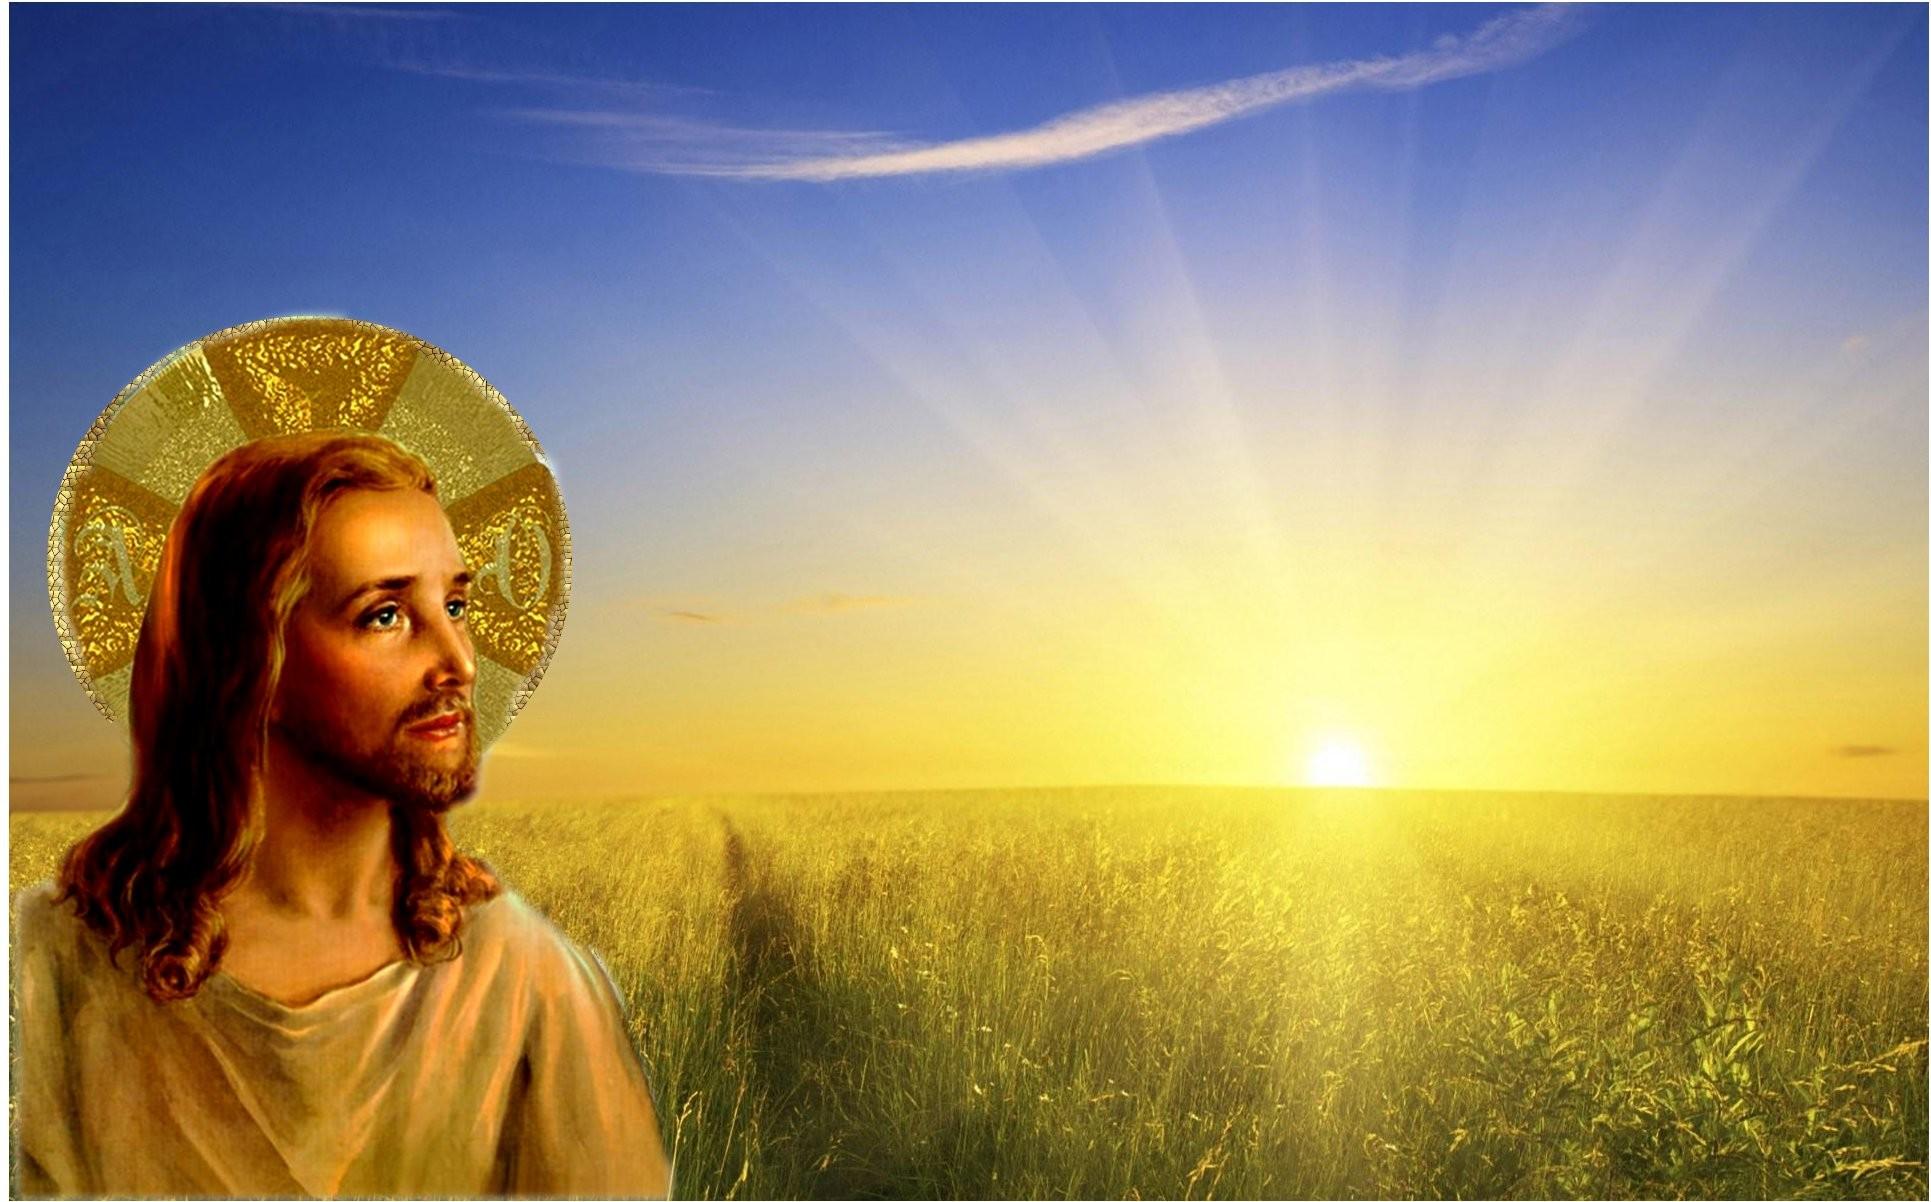 Jesus Wallpapers Free – Wallpaper Cave